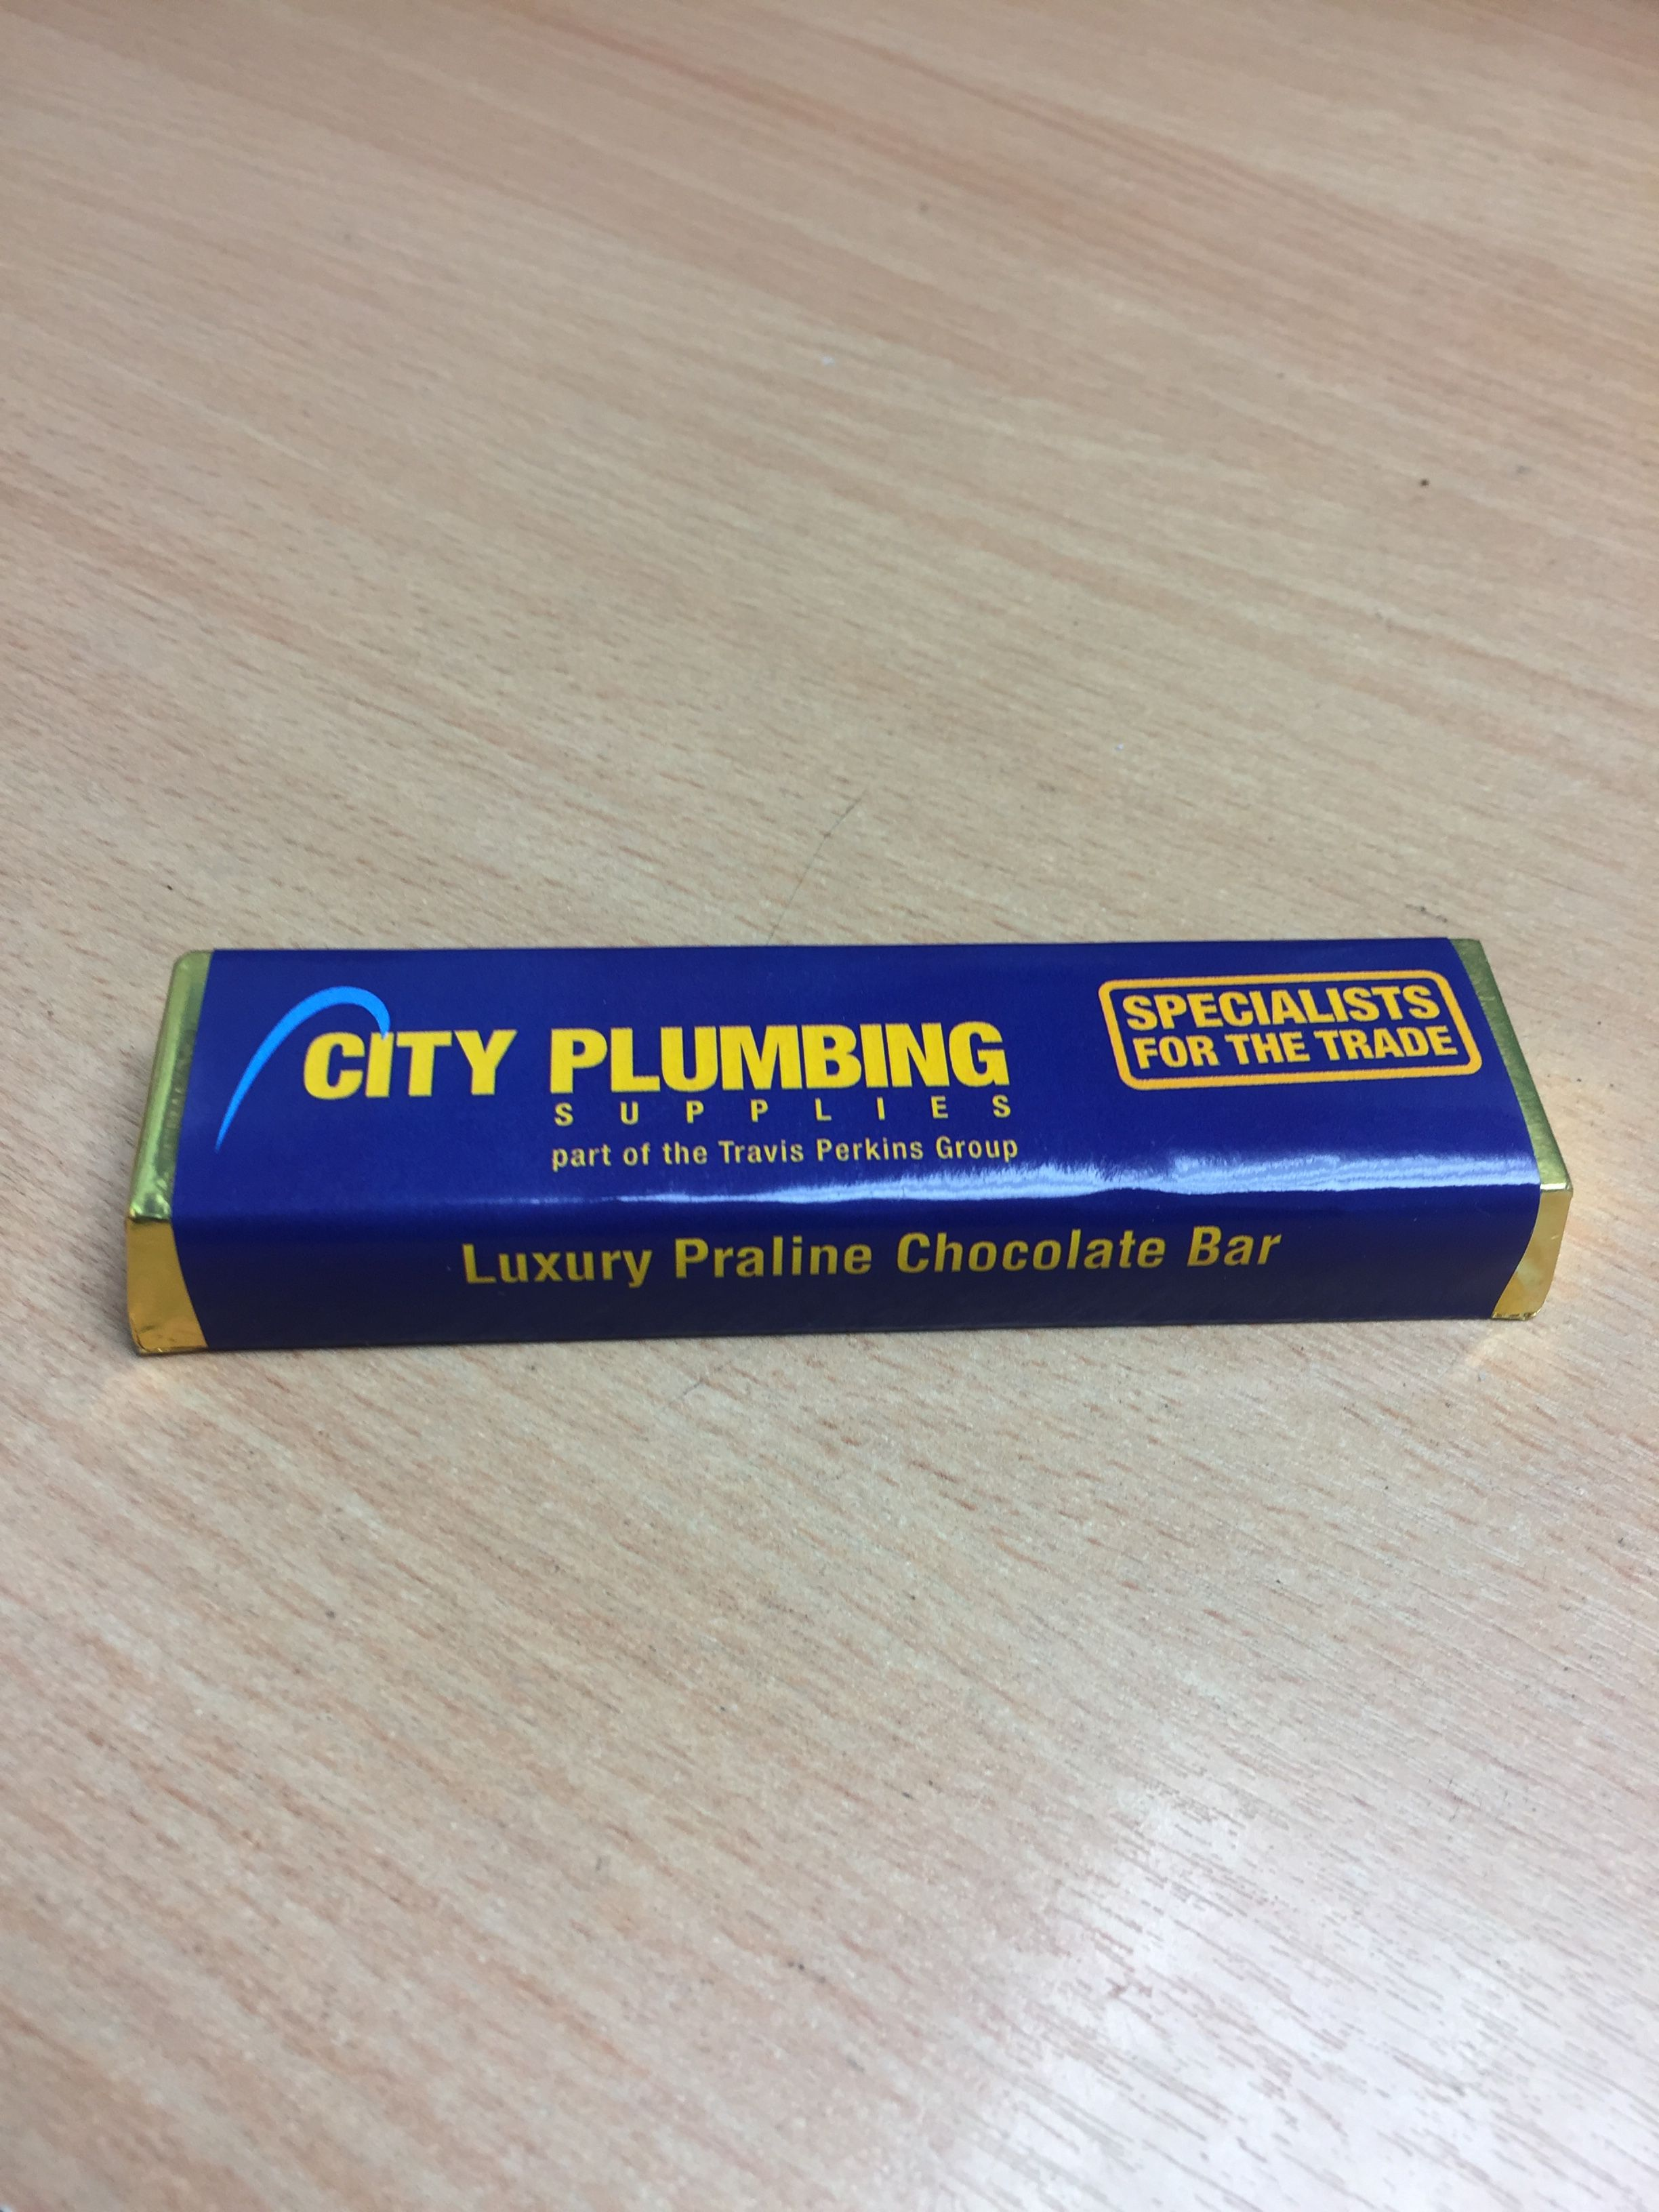 Pin by CITY PLUMBING SUPPLIES on City Plumbing Supplies ...